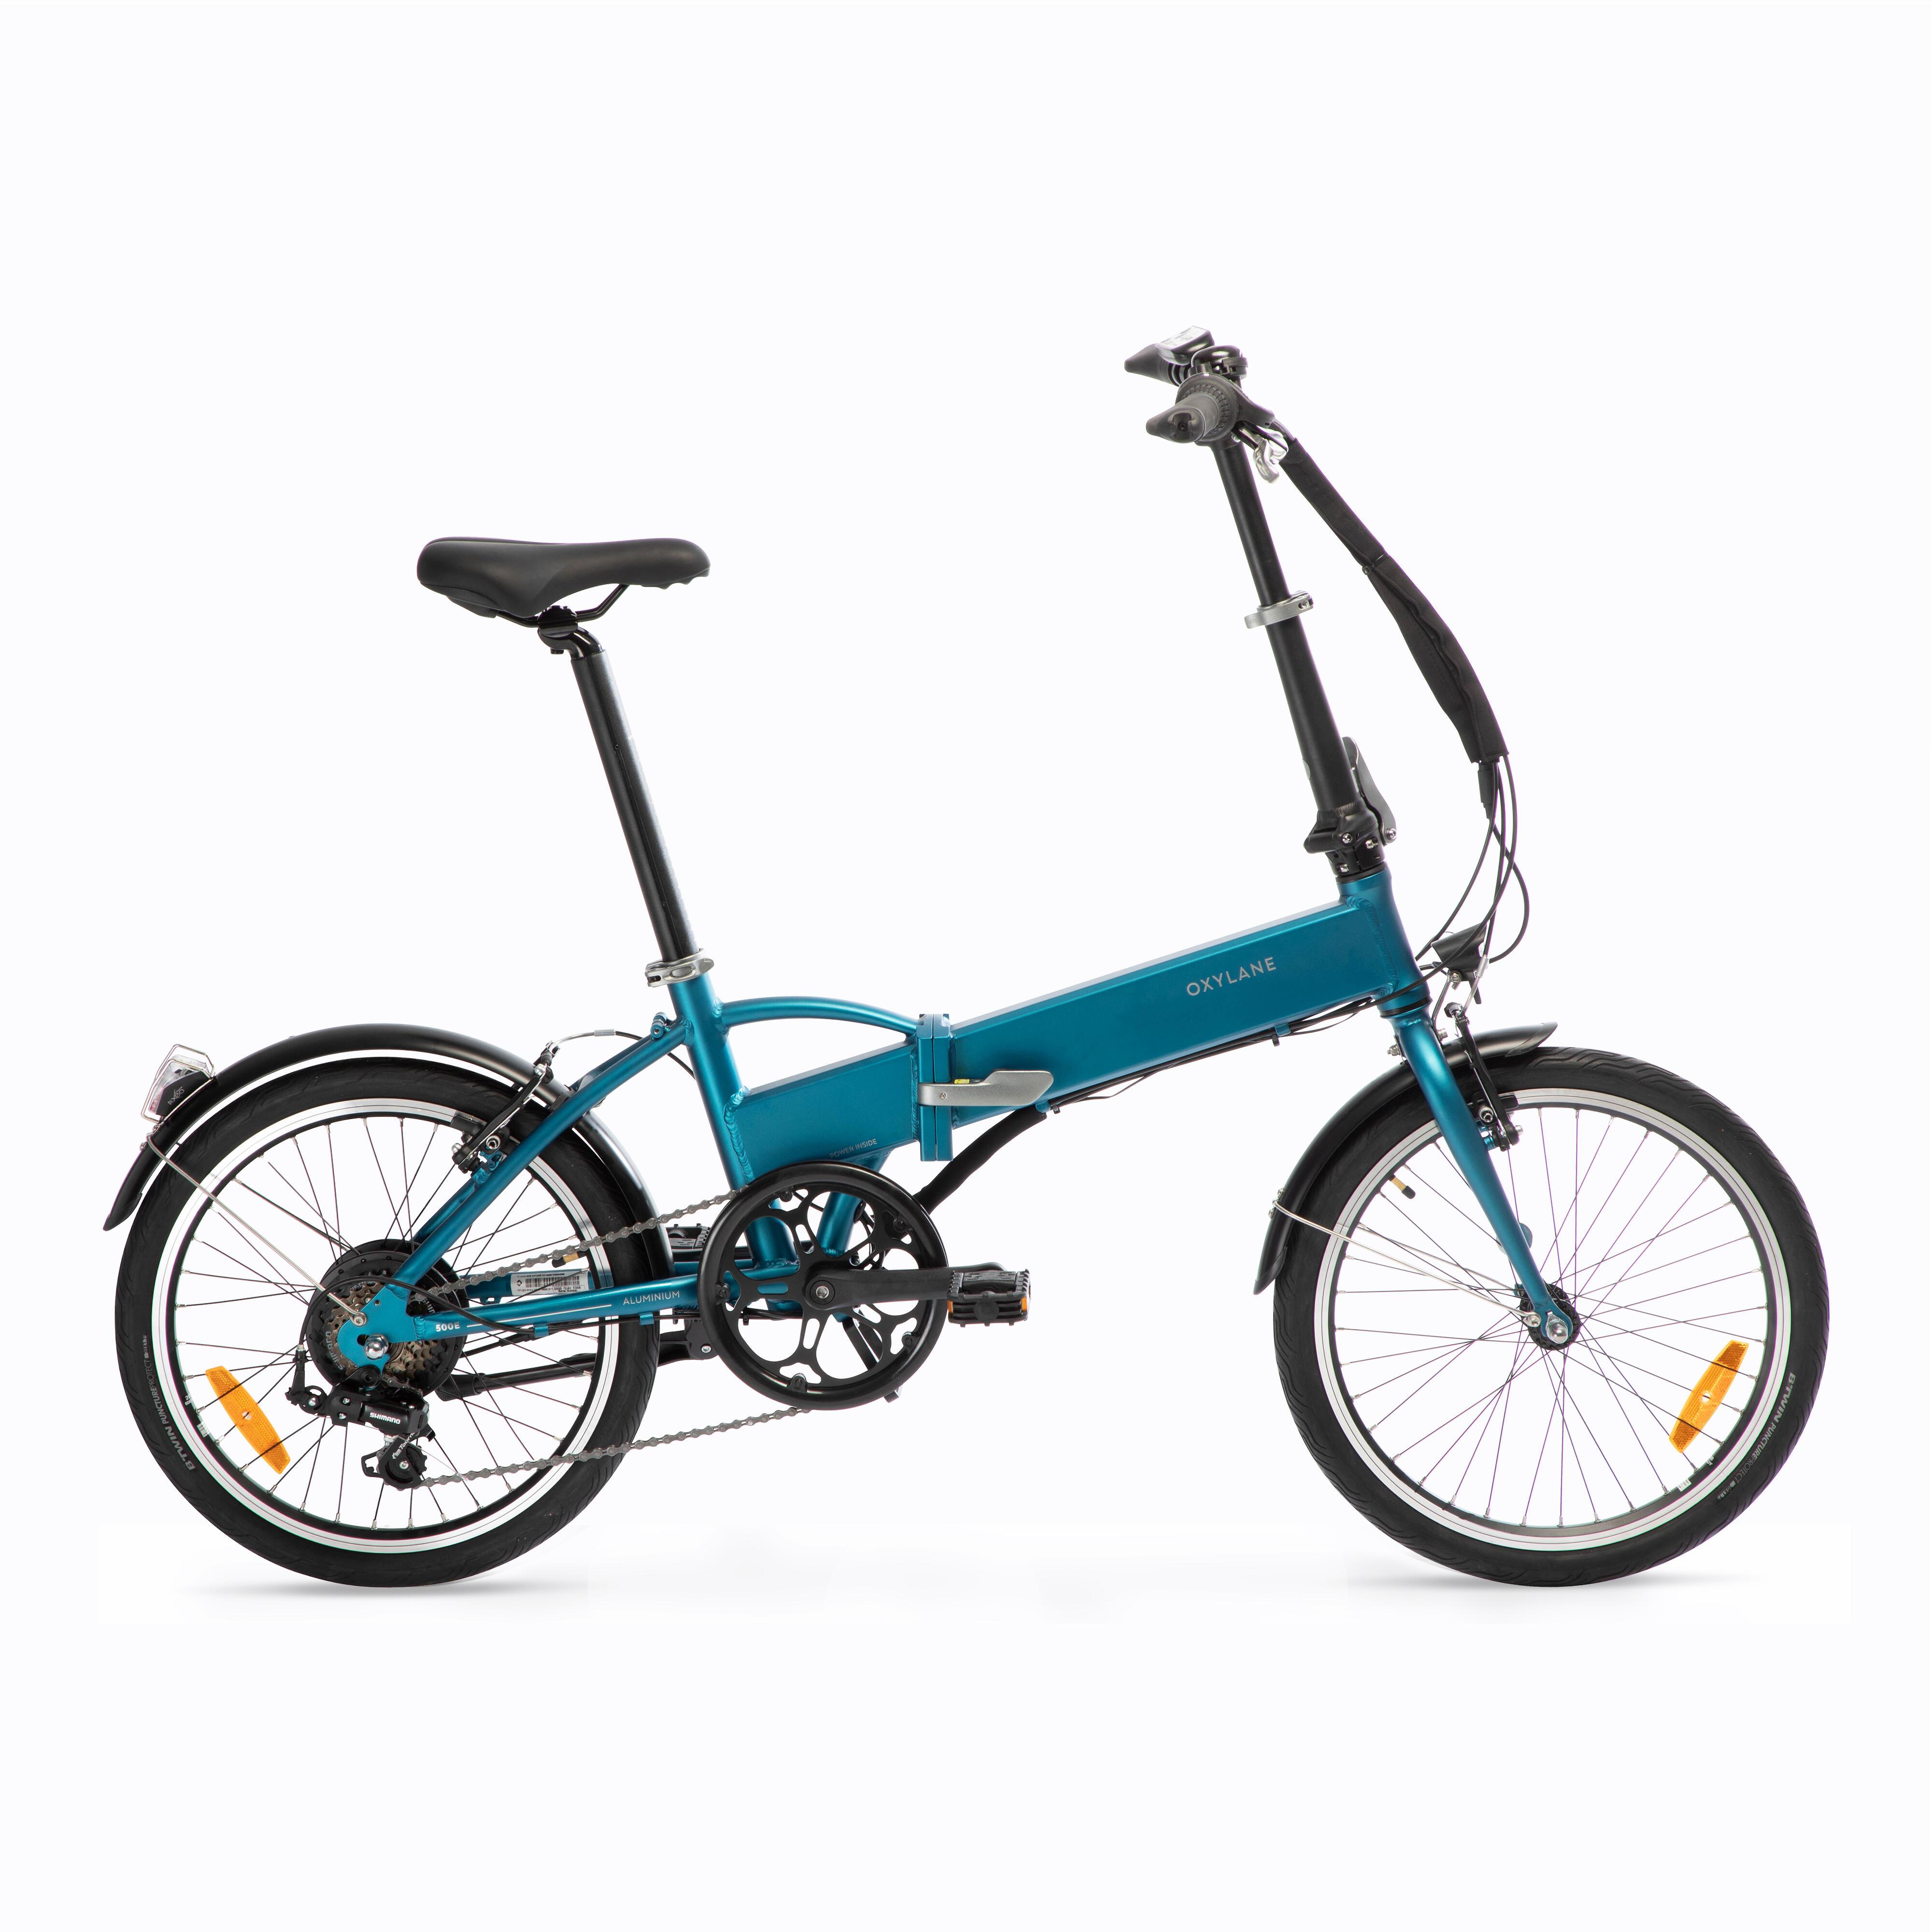 BTWIN Bici pieghevole a pedalata assistita TILT 500 E azzurra